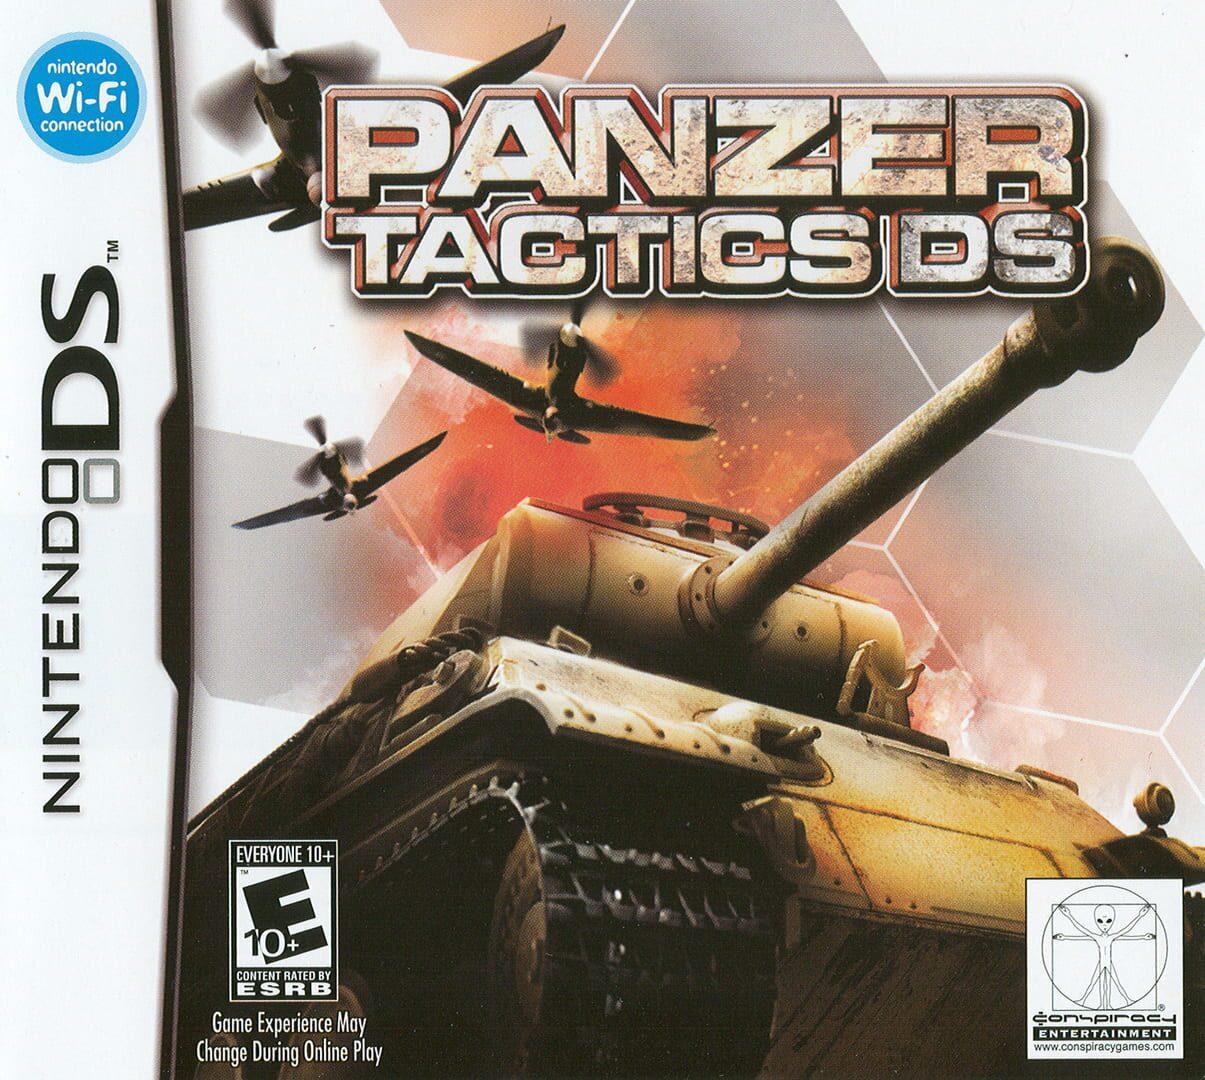 buy Panzer Tactics DS cd key for all platform